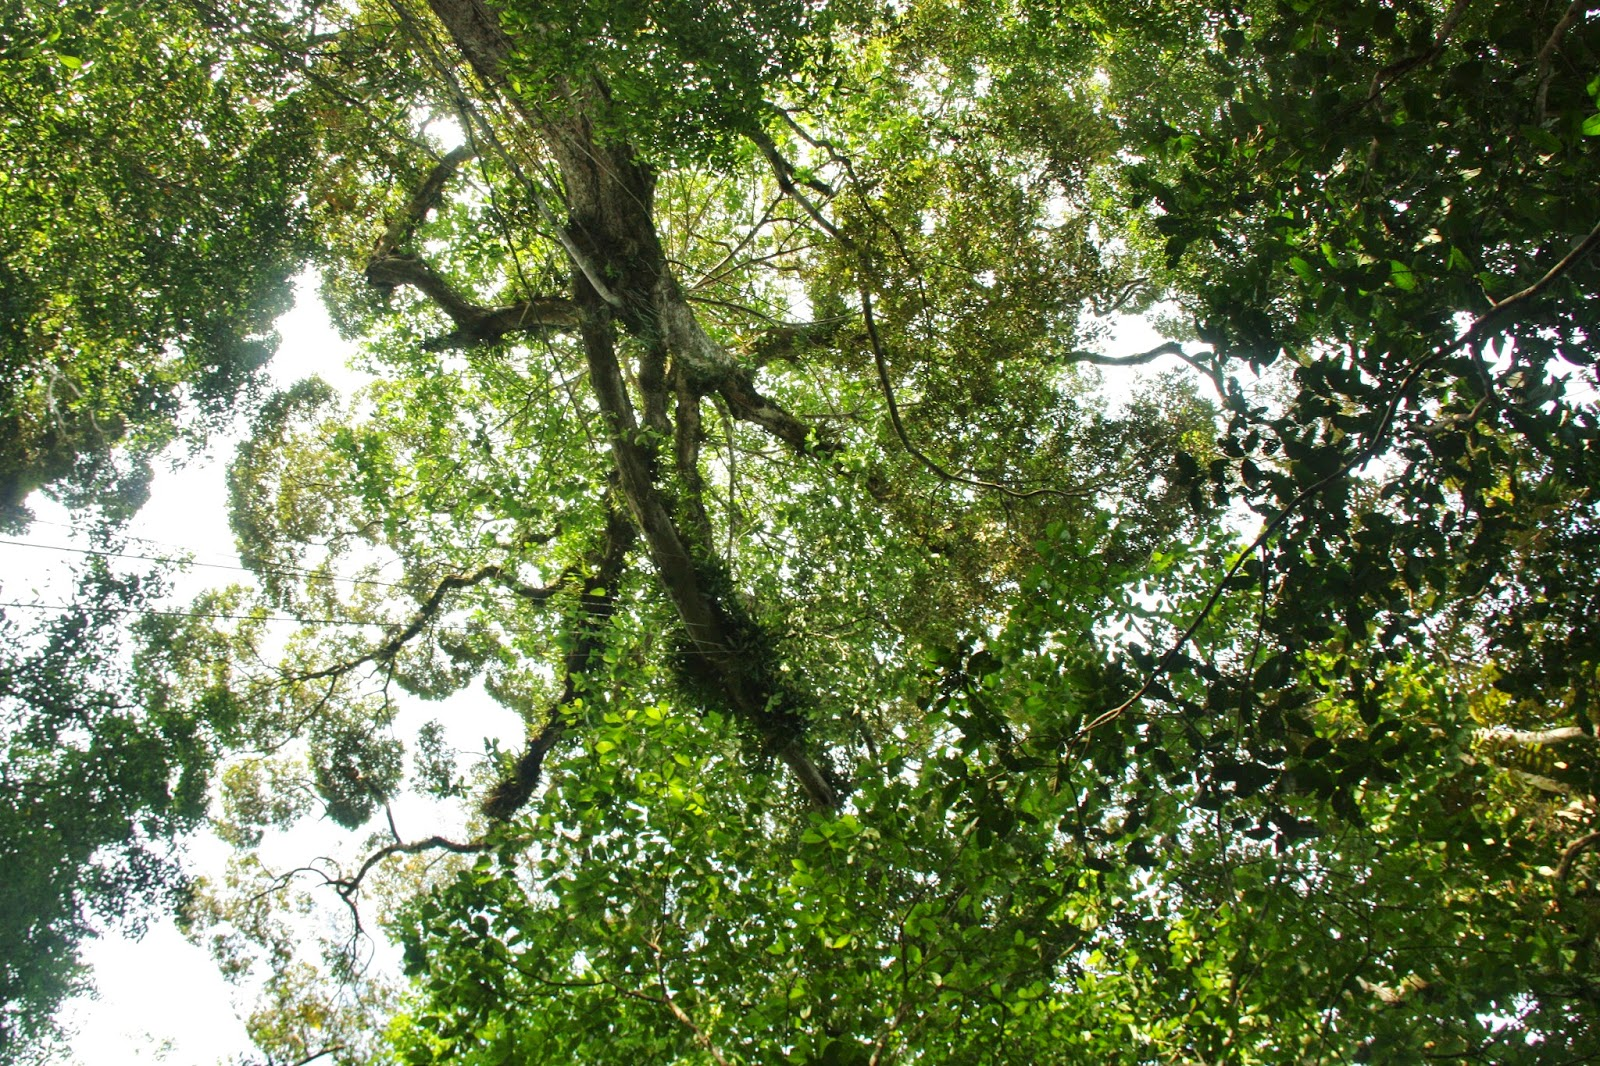 Copa das árvores na Reserva Mamirauá.